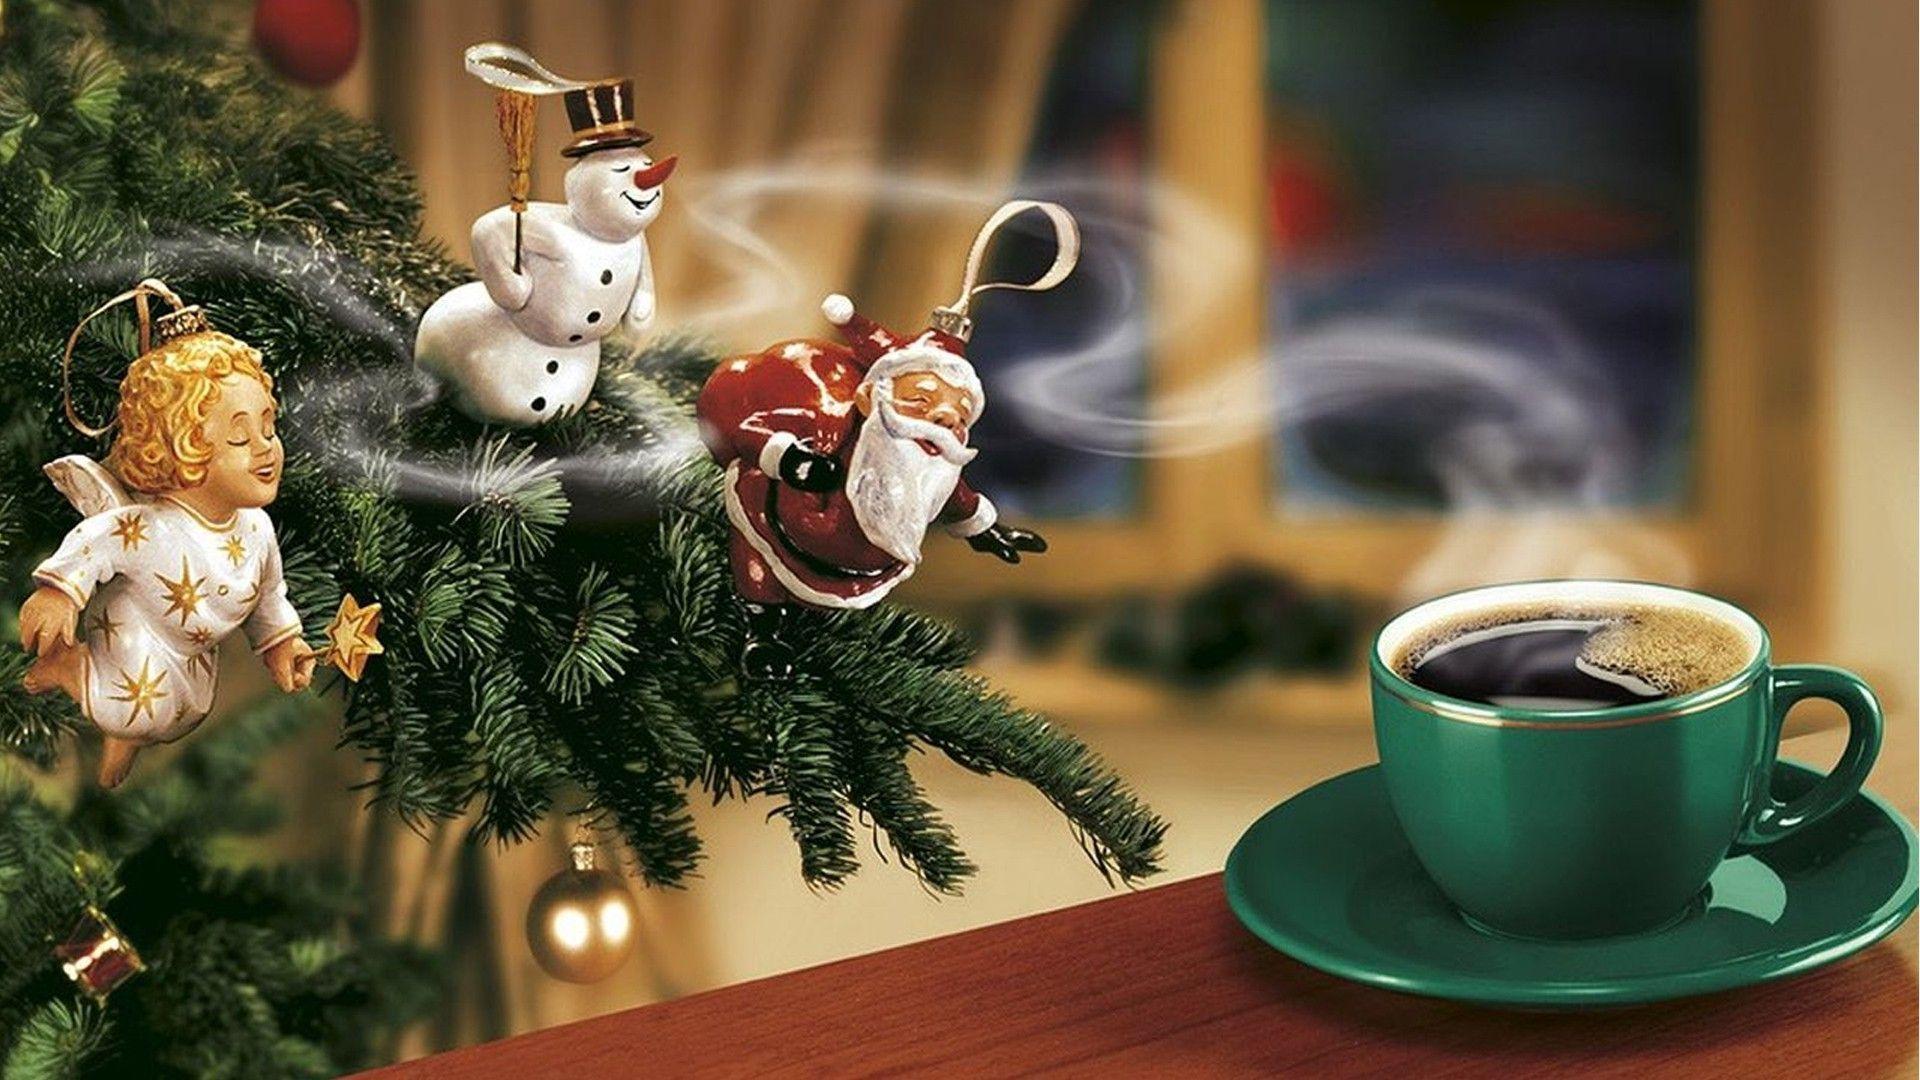 Coffee Christmas Morning.Christmas Morning Coffee Coffee And Mornings Christmas